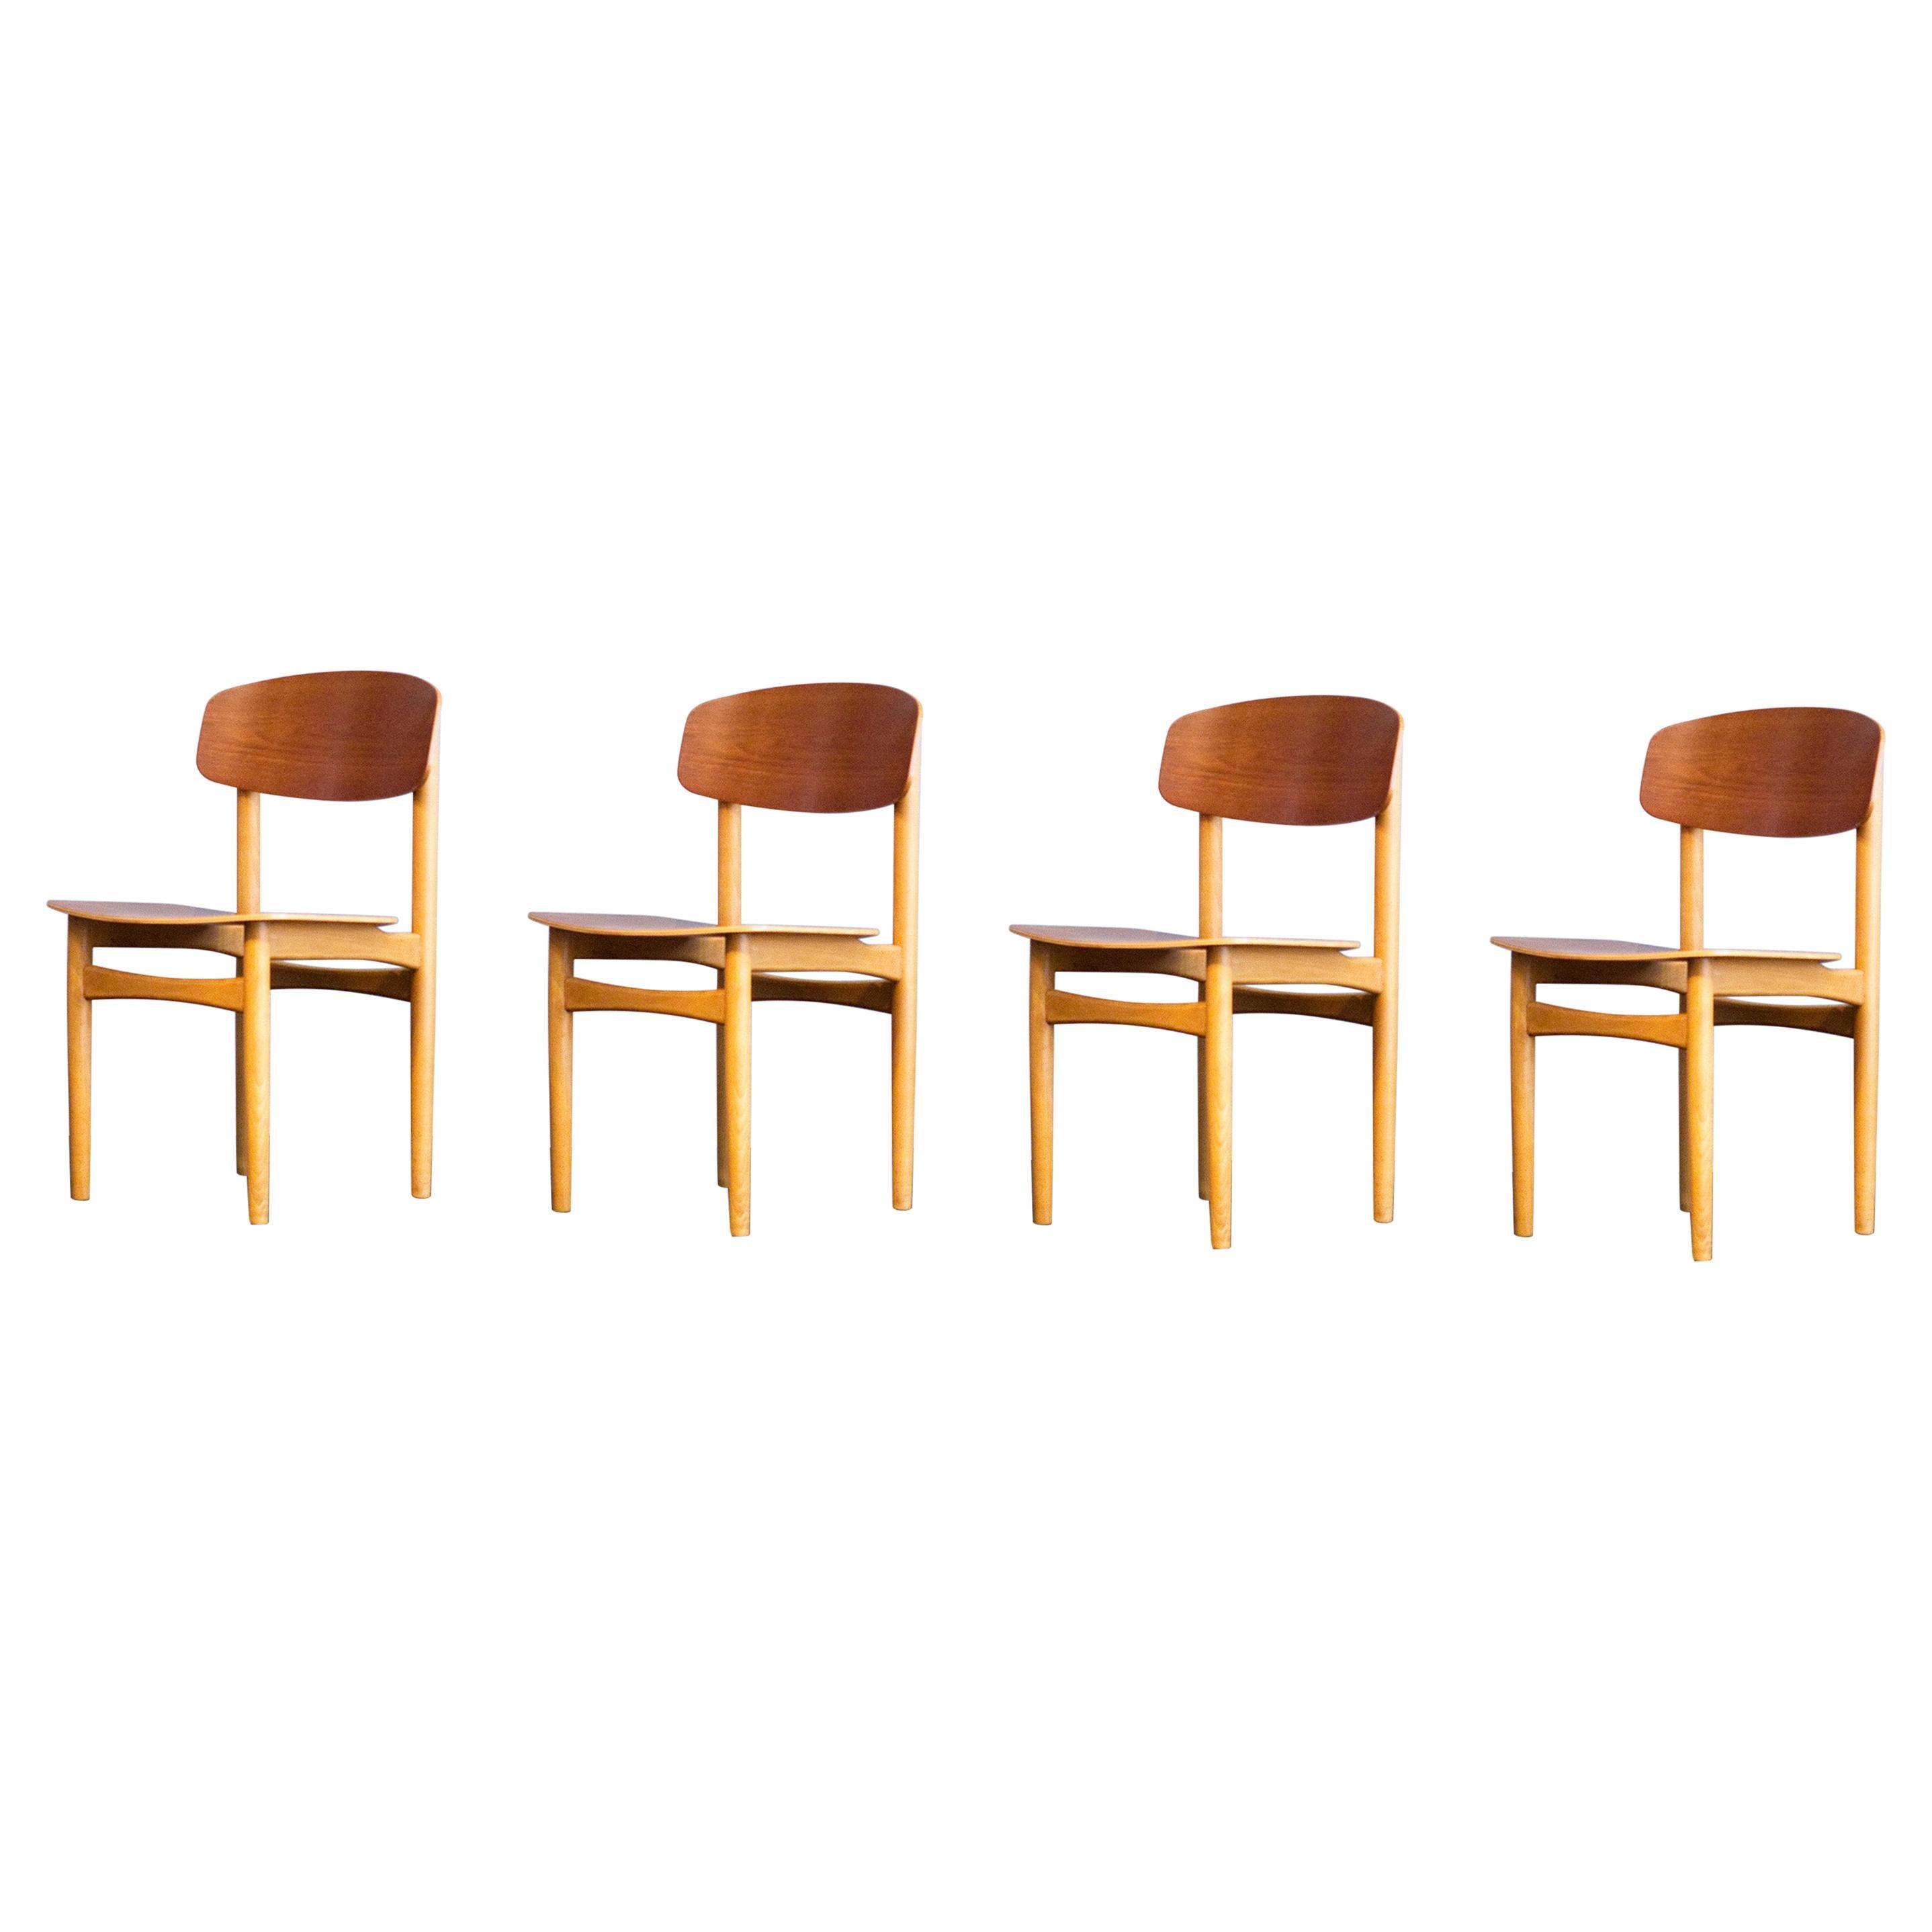 Set of 4x Borge Mogensen Teak & Beech Chairs Model 122, Made by Soborg Mobler